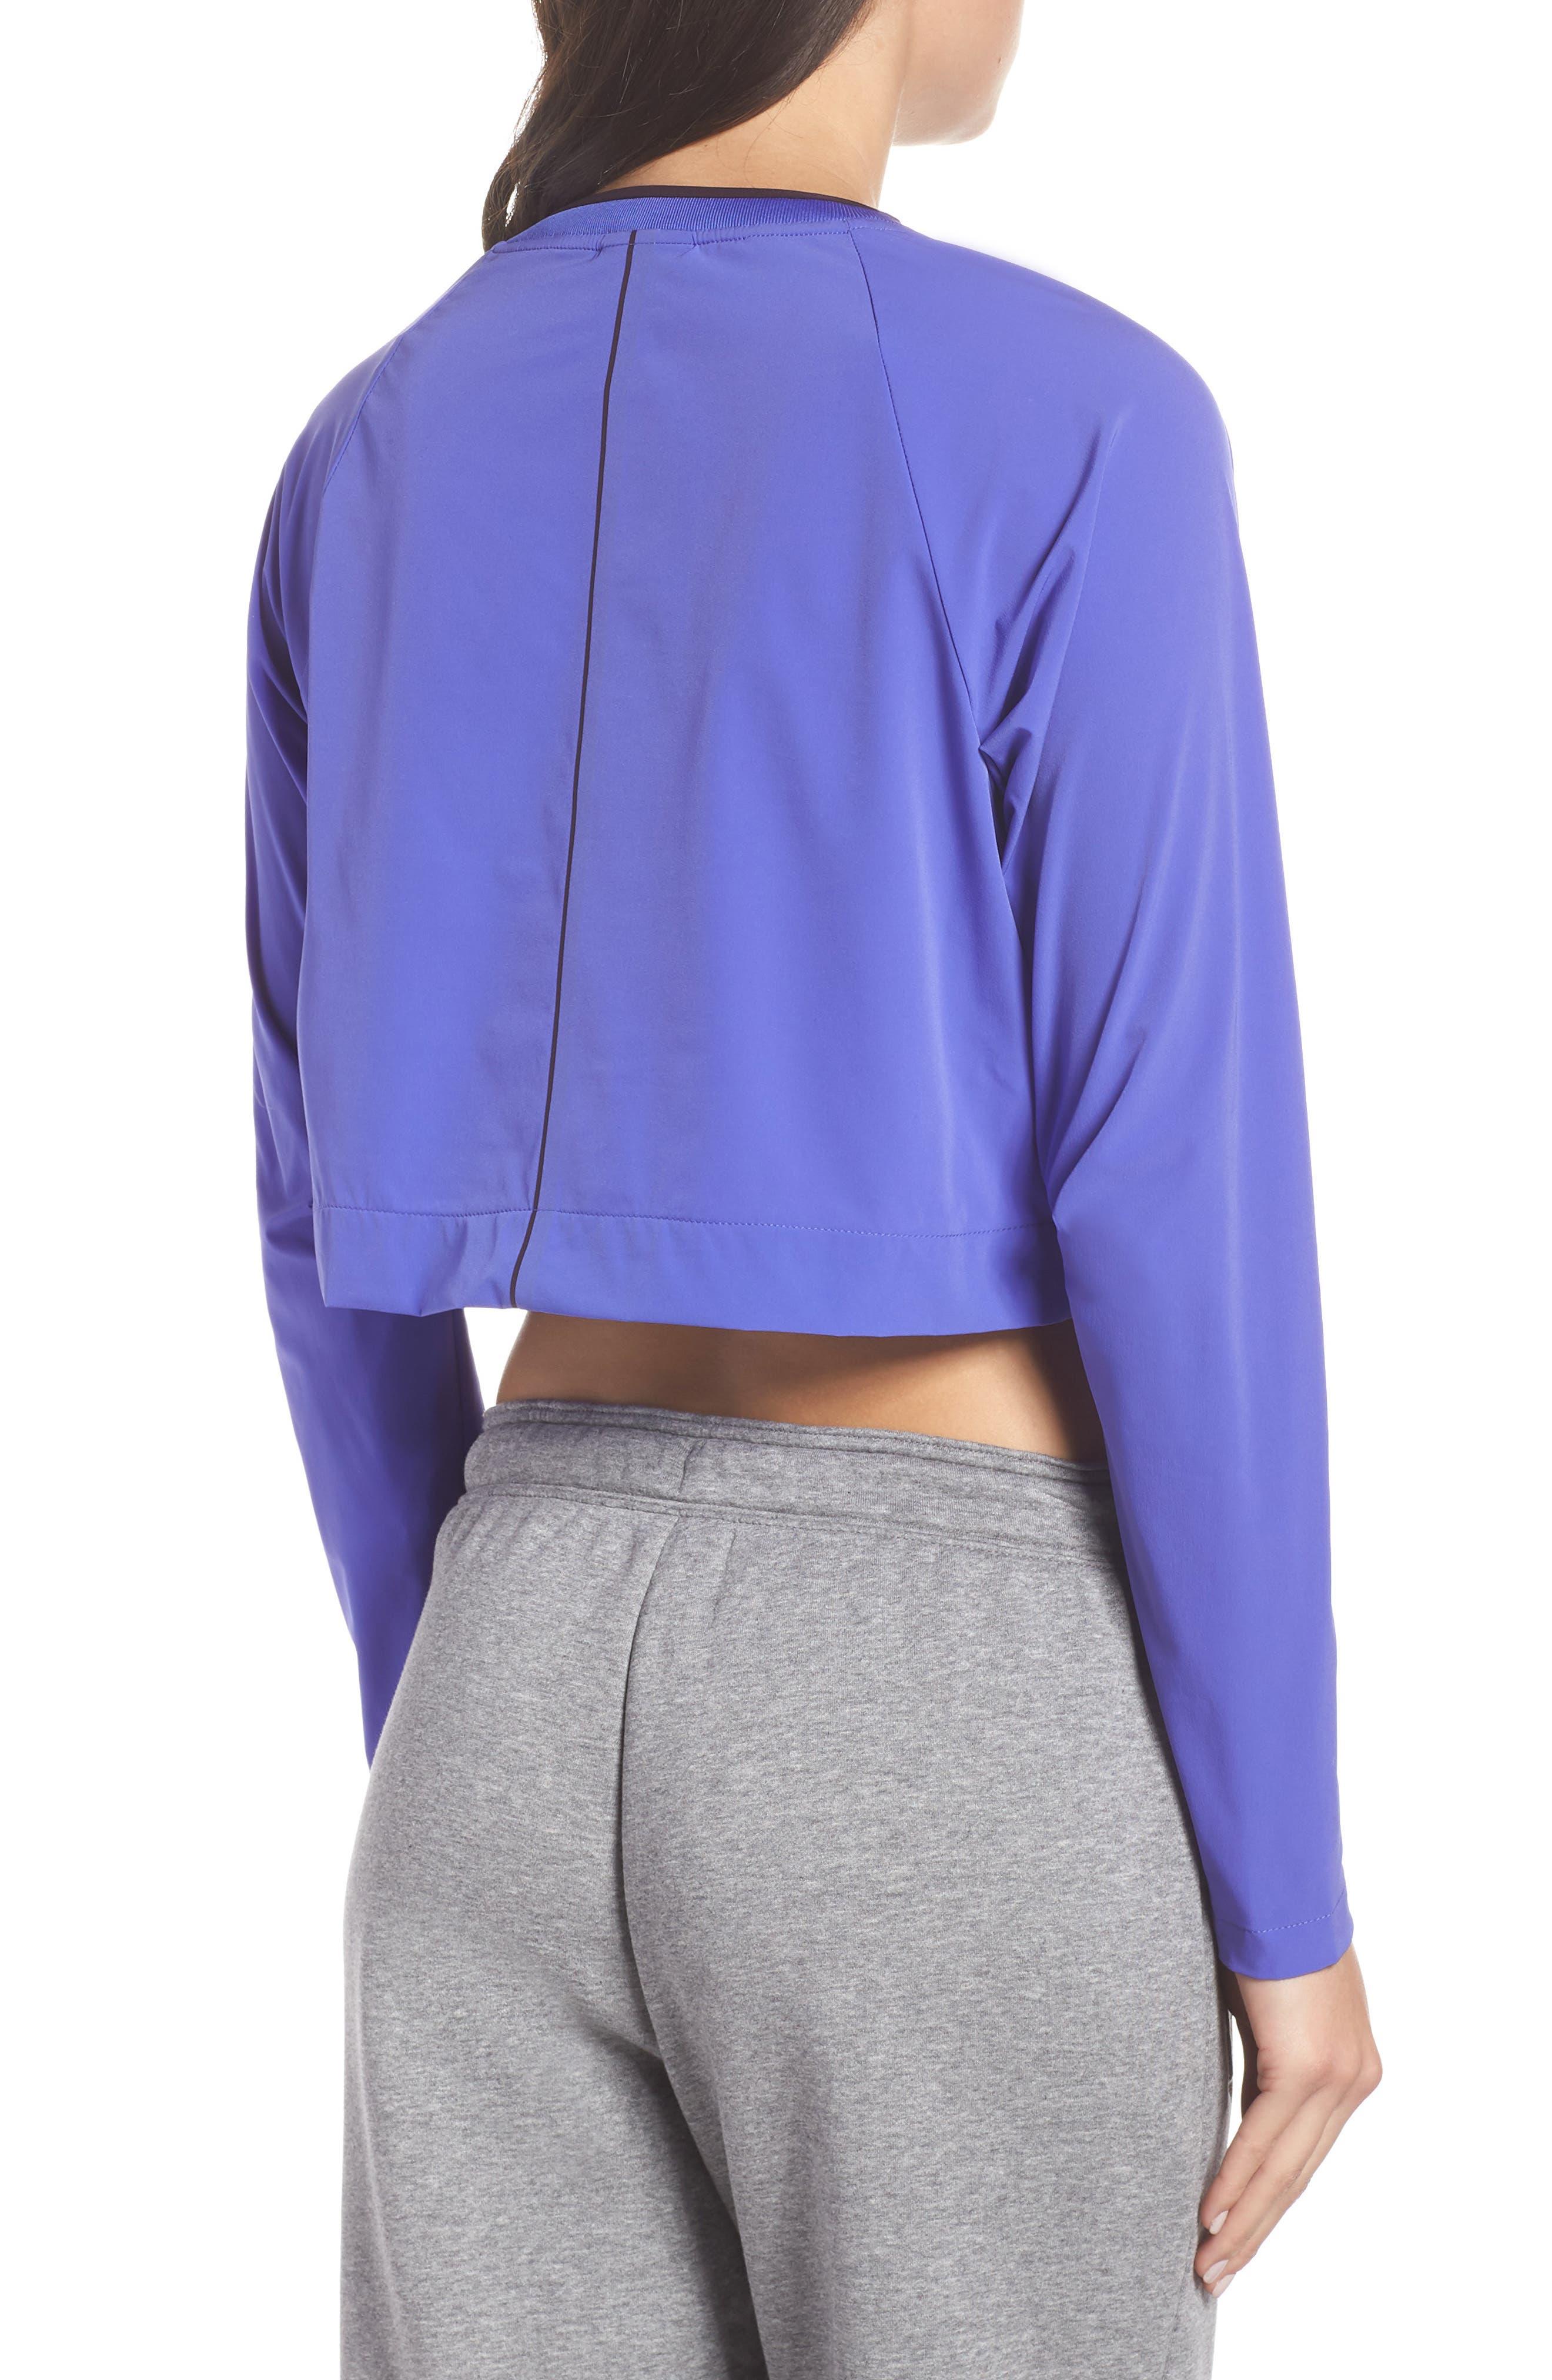 Sportswear Tech Pack Women's Long Sleeve Top,                             Alternate thumbnail 2, color,                             PERSIAN VIOLET/ BURGUNDY ASH